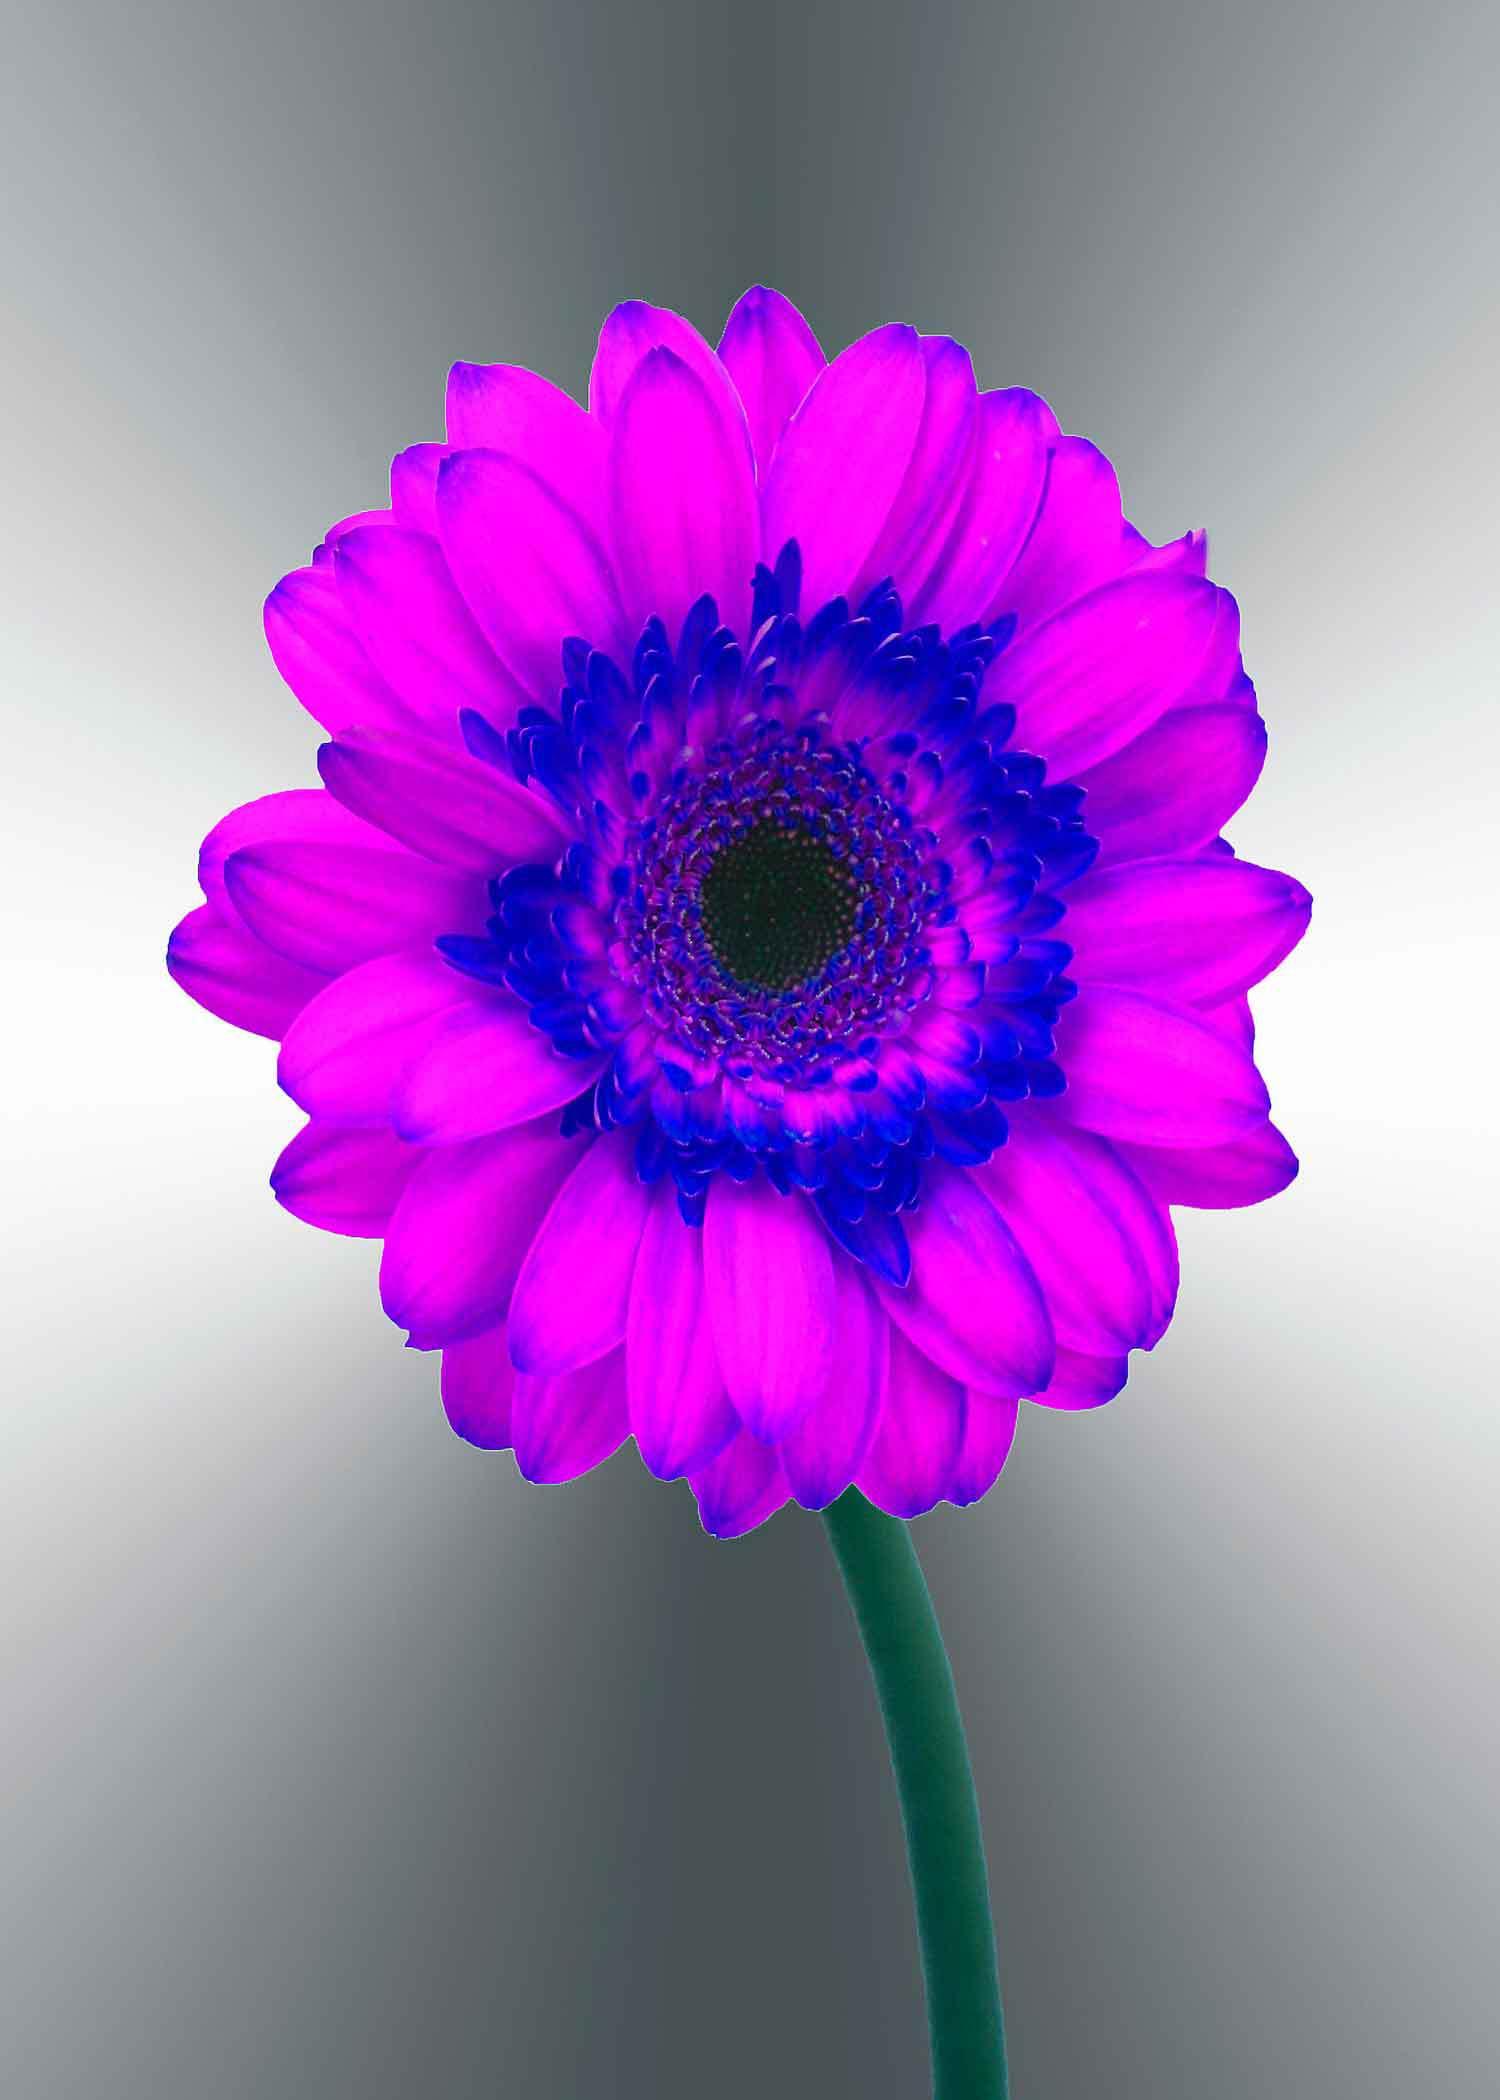 purple-gerger-daisy-5x7-(22-of-236)-Edit-2-copy-2.jpg